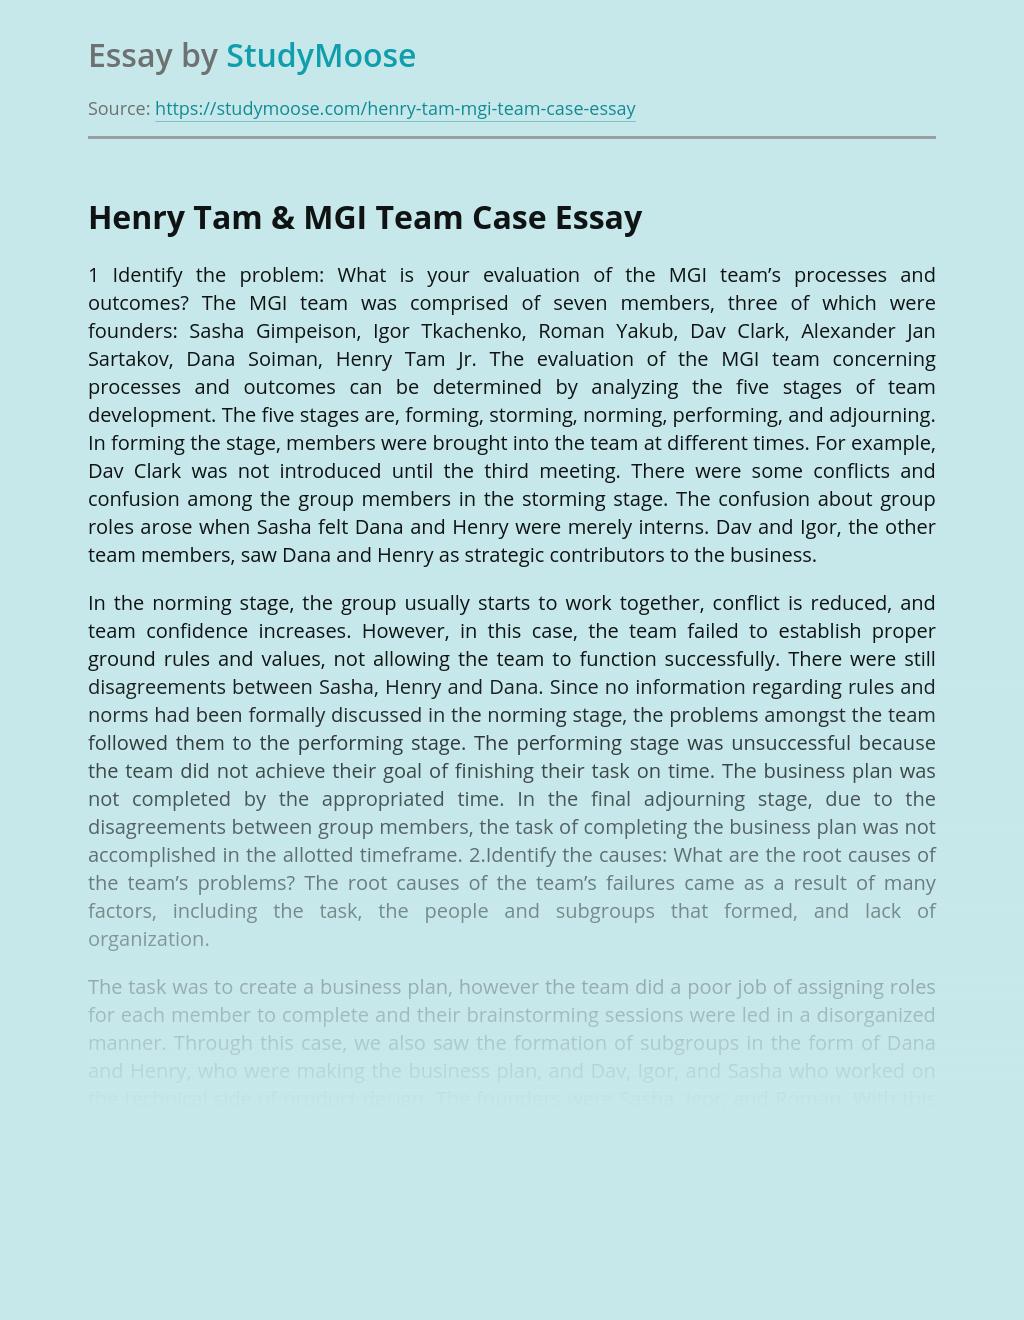 Henry Tam & MGI Team Case